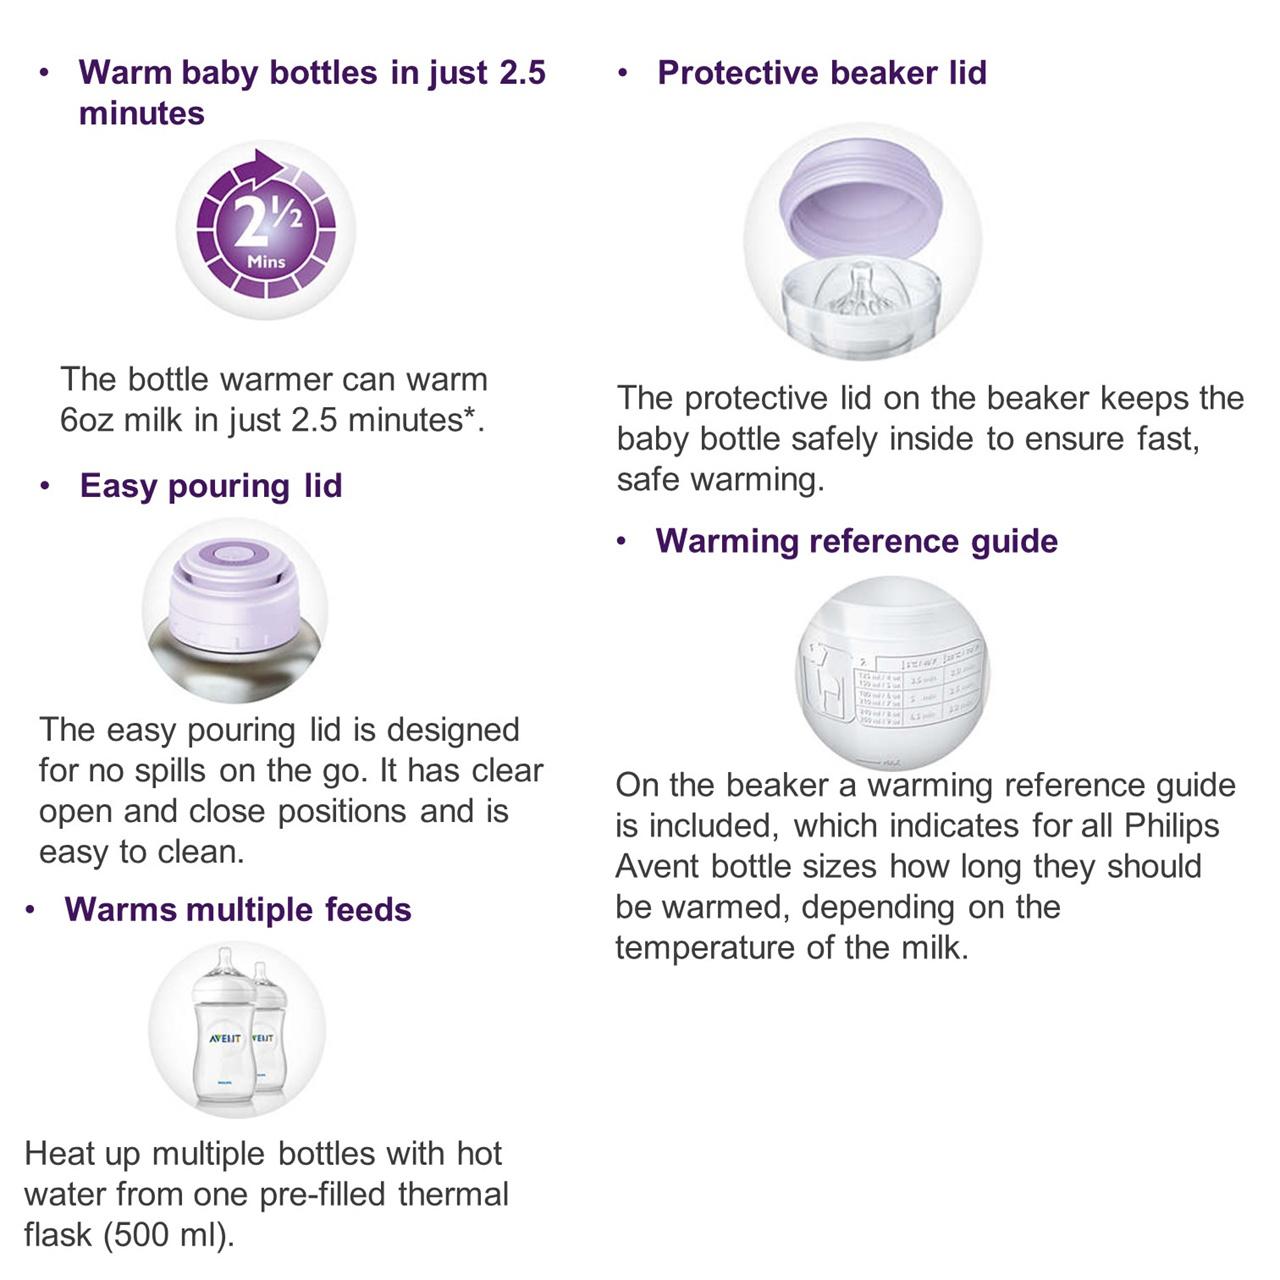 Philips Avent Bottle Warmer Directions The Best Bottle Of 2018